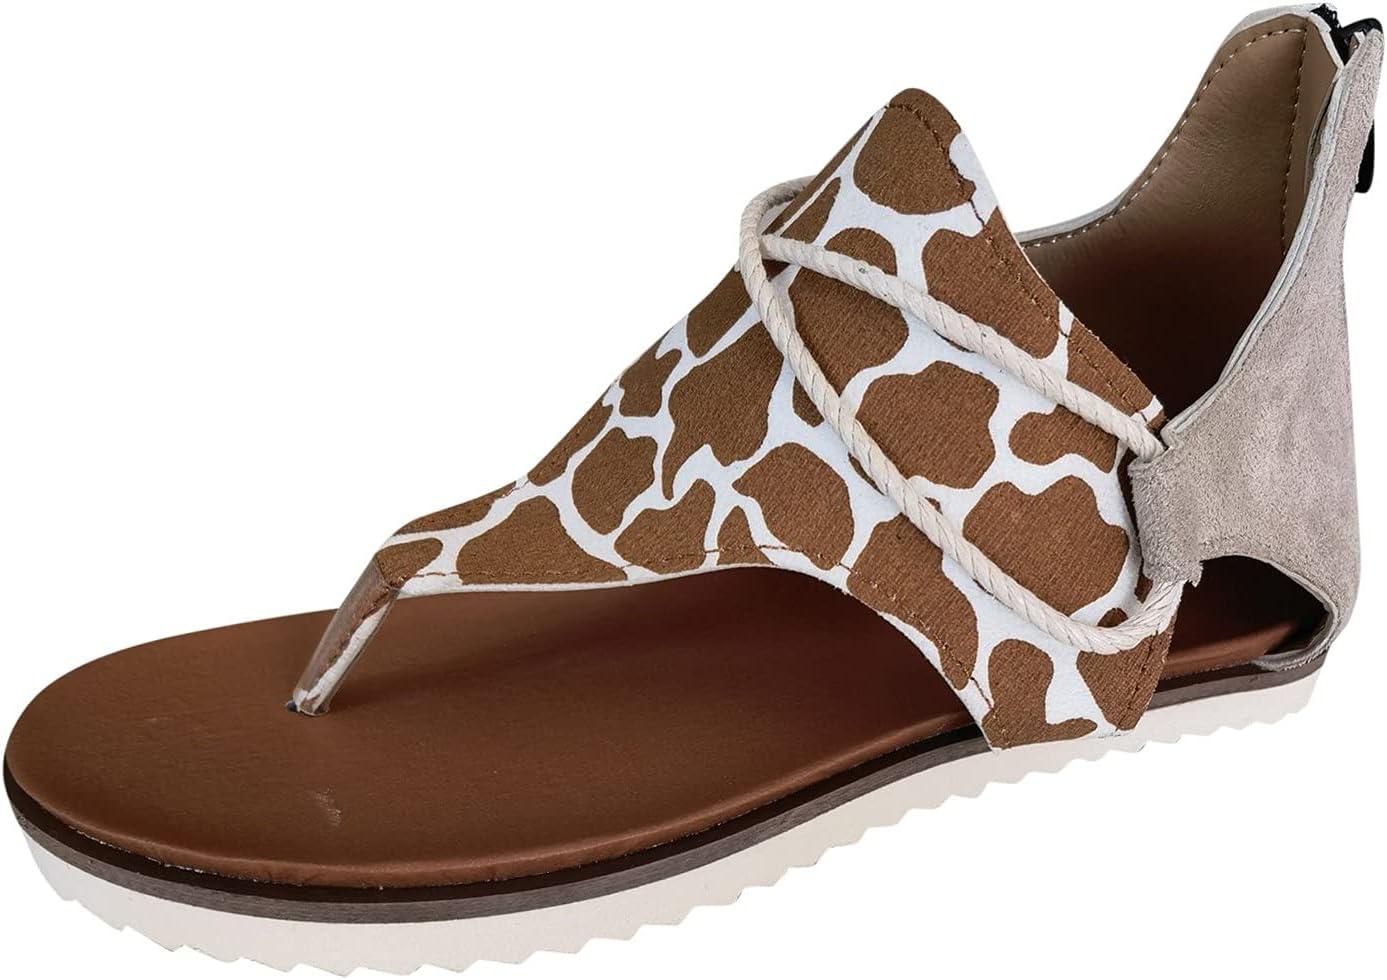 PLENTOP Gladiator low-pricing Sandals for Women Rubber Wedge Low-Heel Beach Ranking TOP6